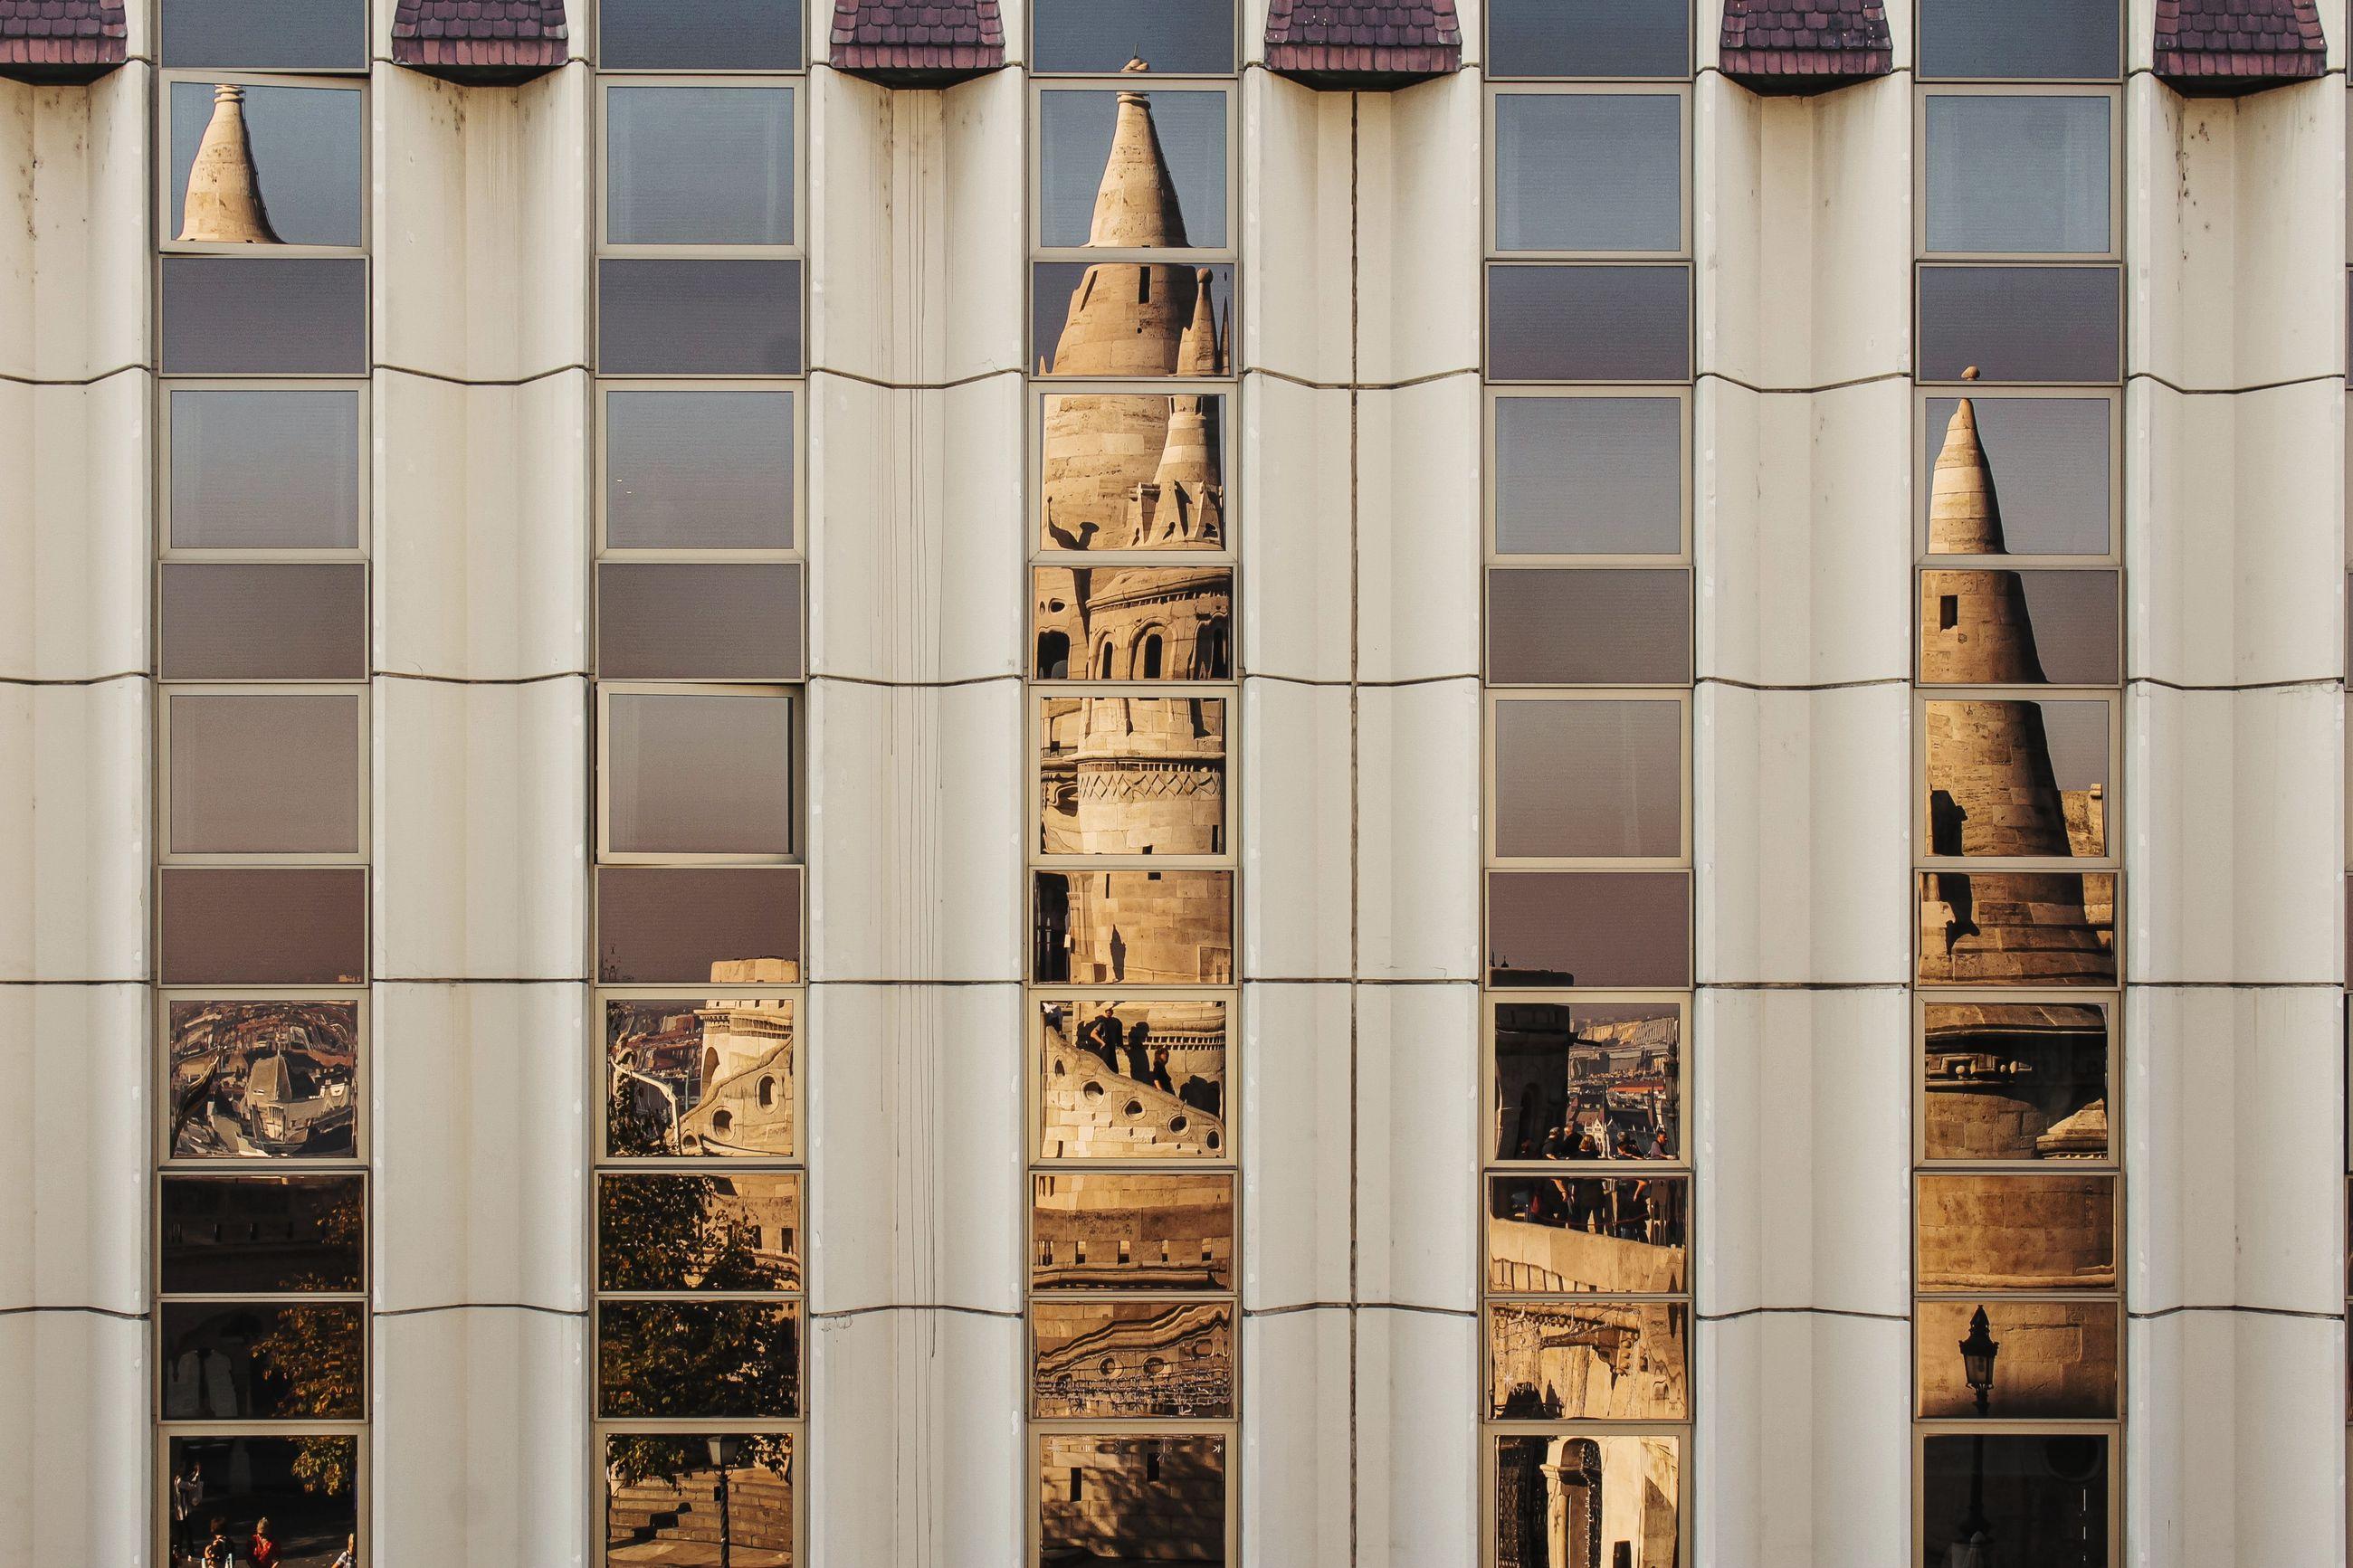 Full frame shot of building reflection